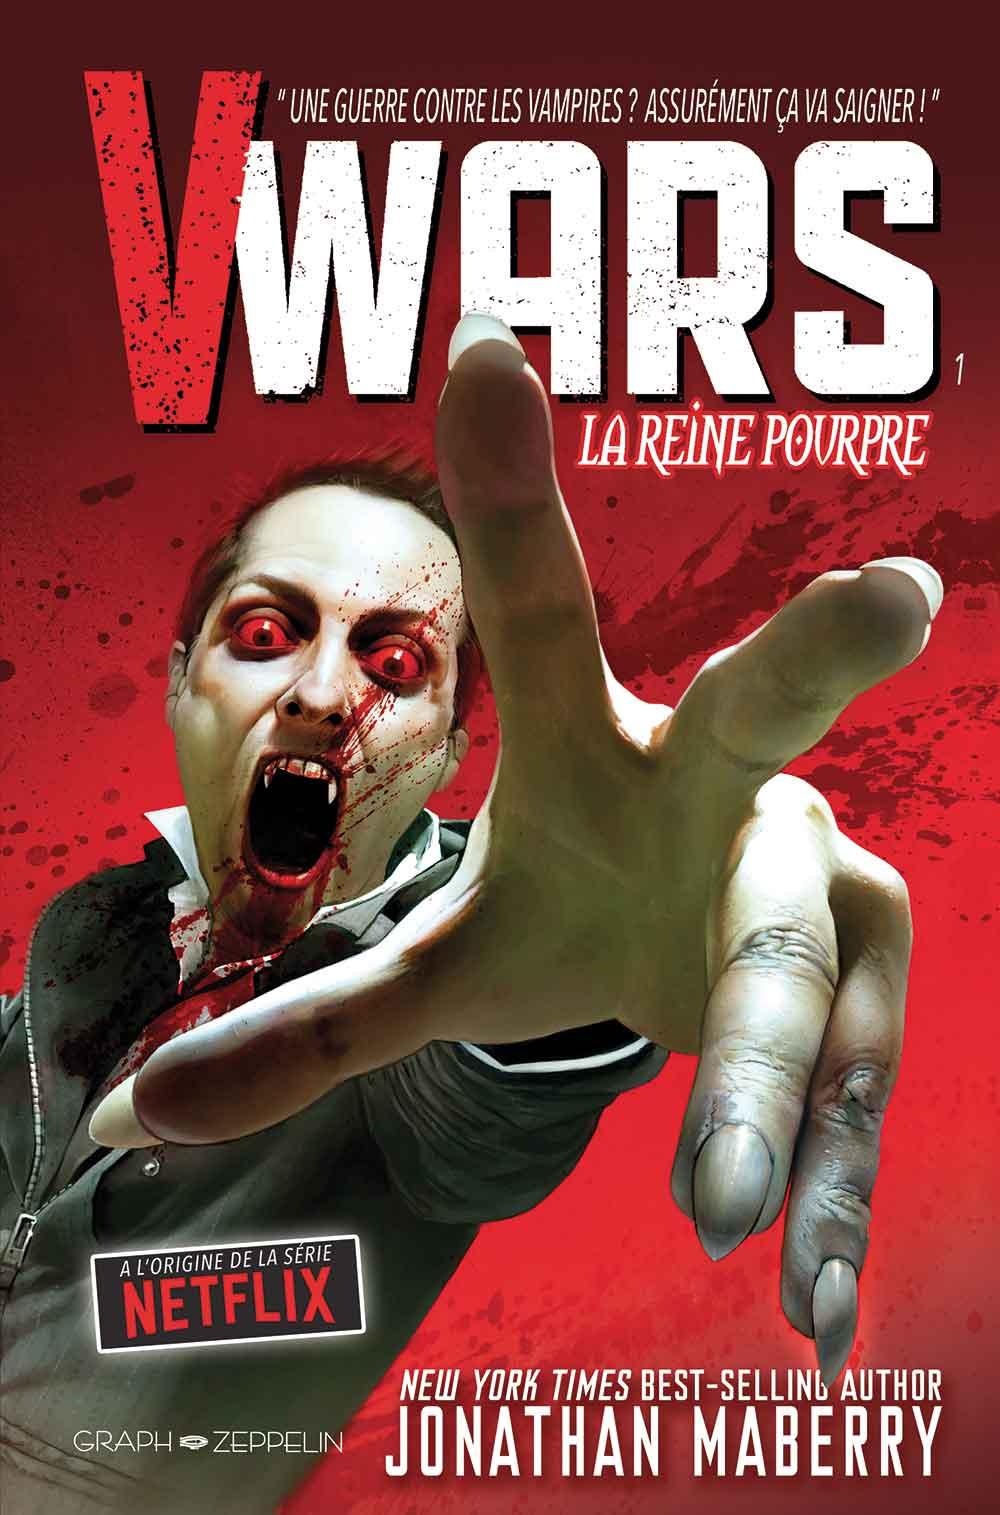 V-WARS, TOME 1: LA REINE POURPRE